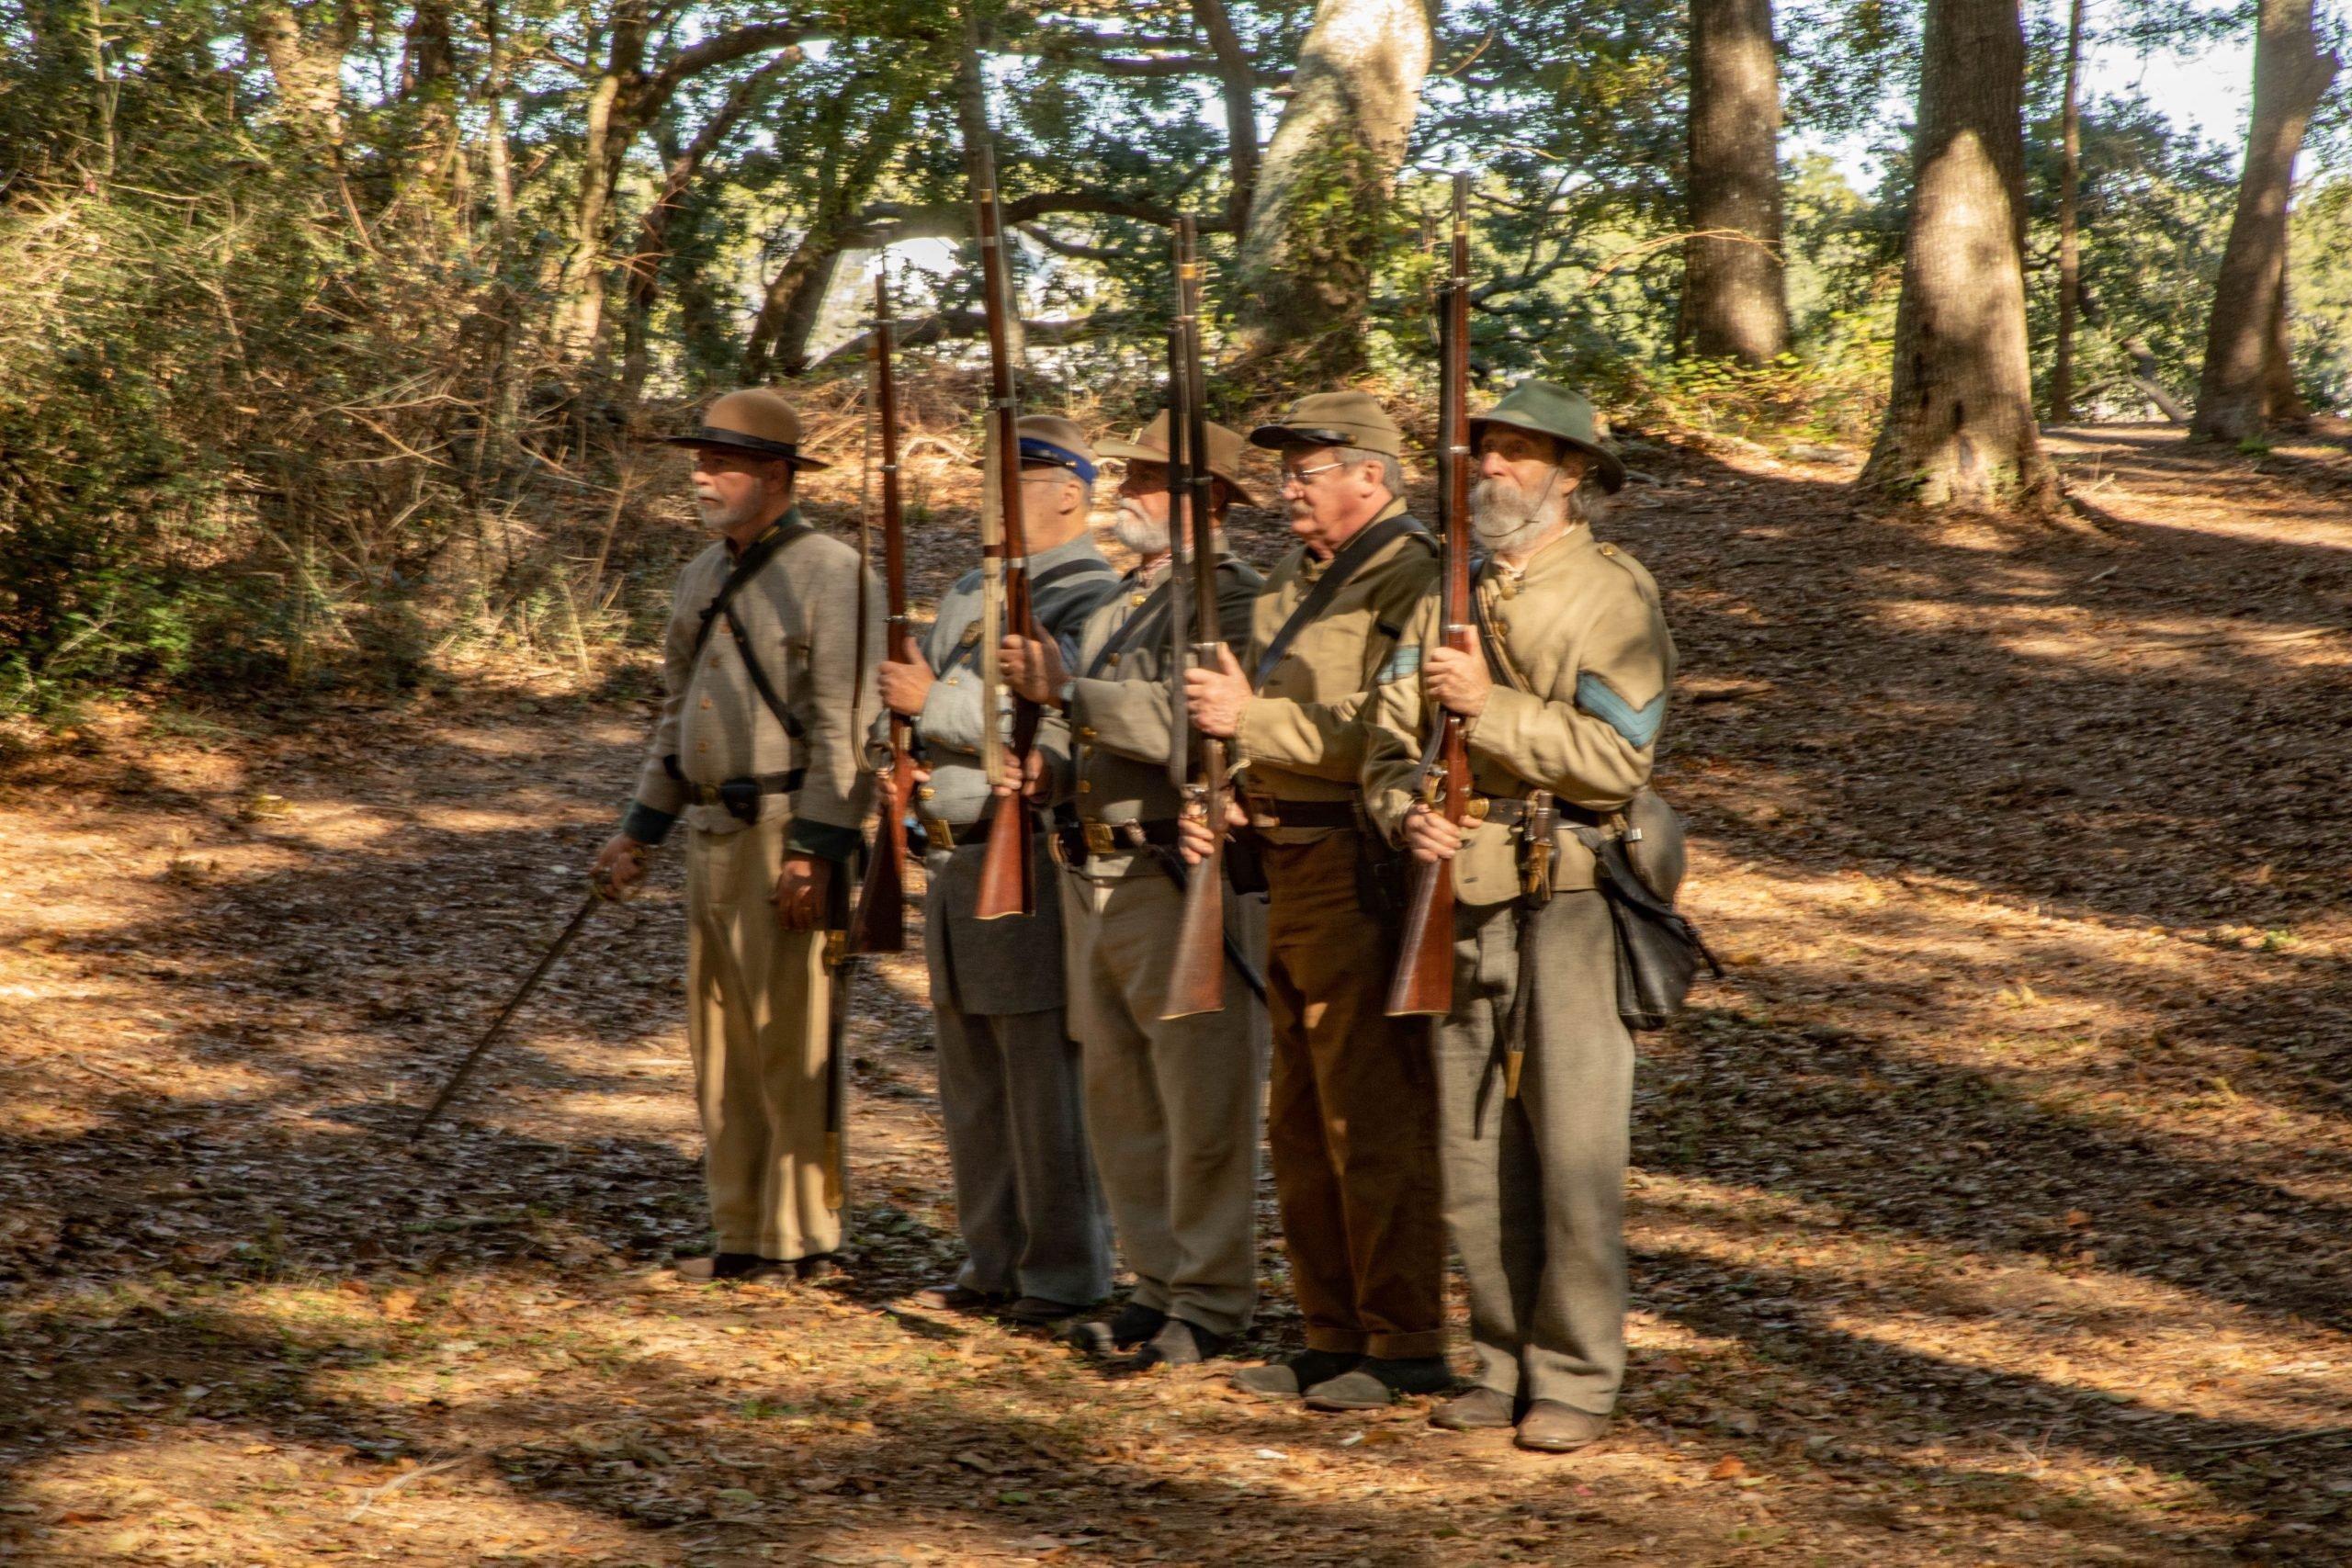 Sons of Confederate Veterans C.S.A. South Carolina 16